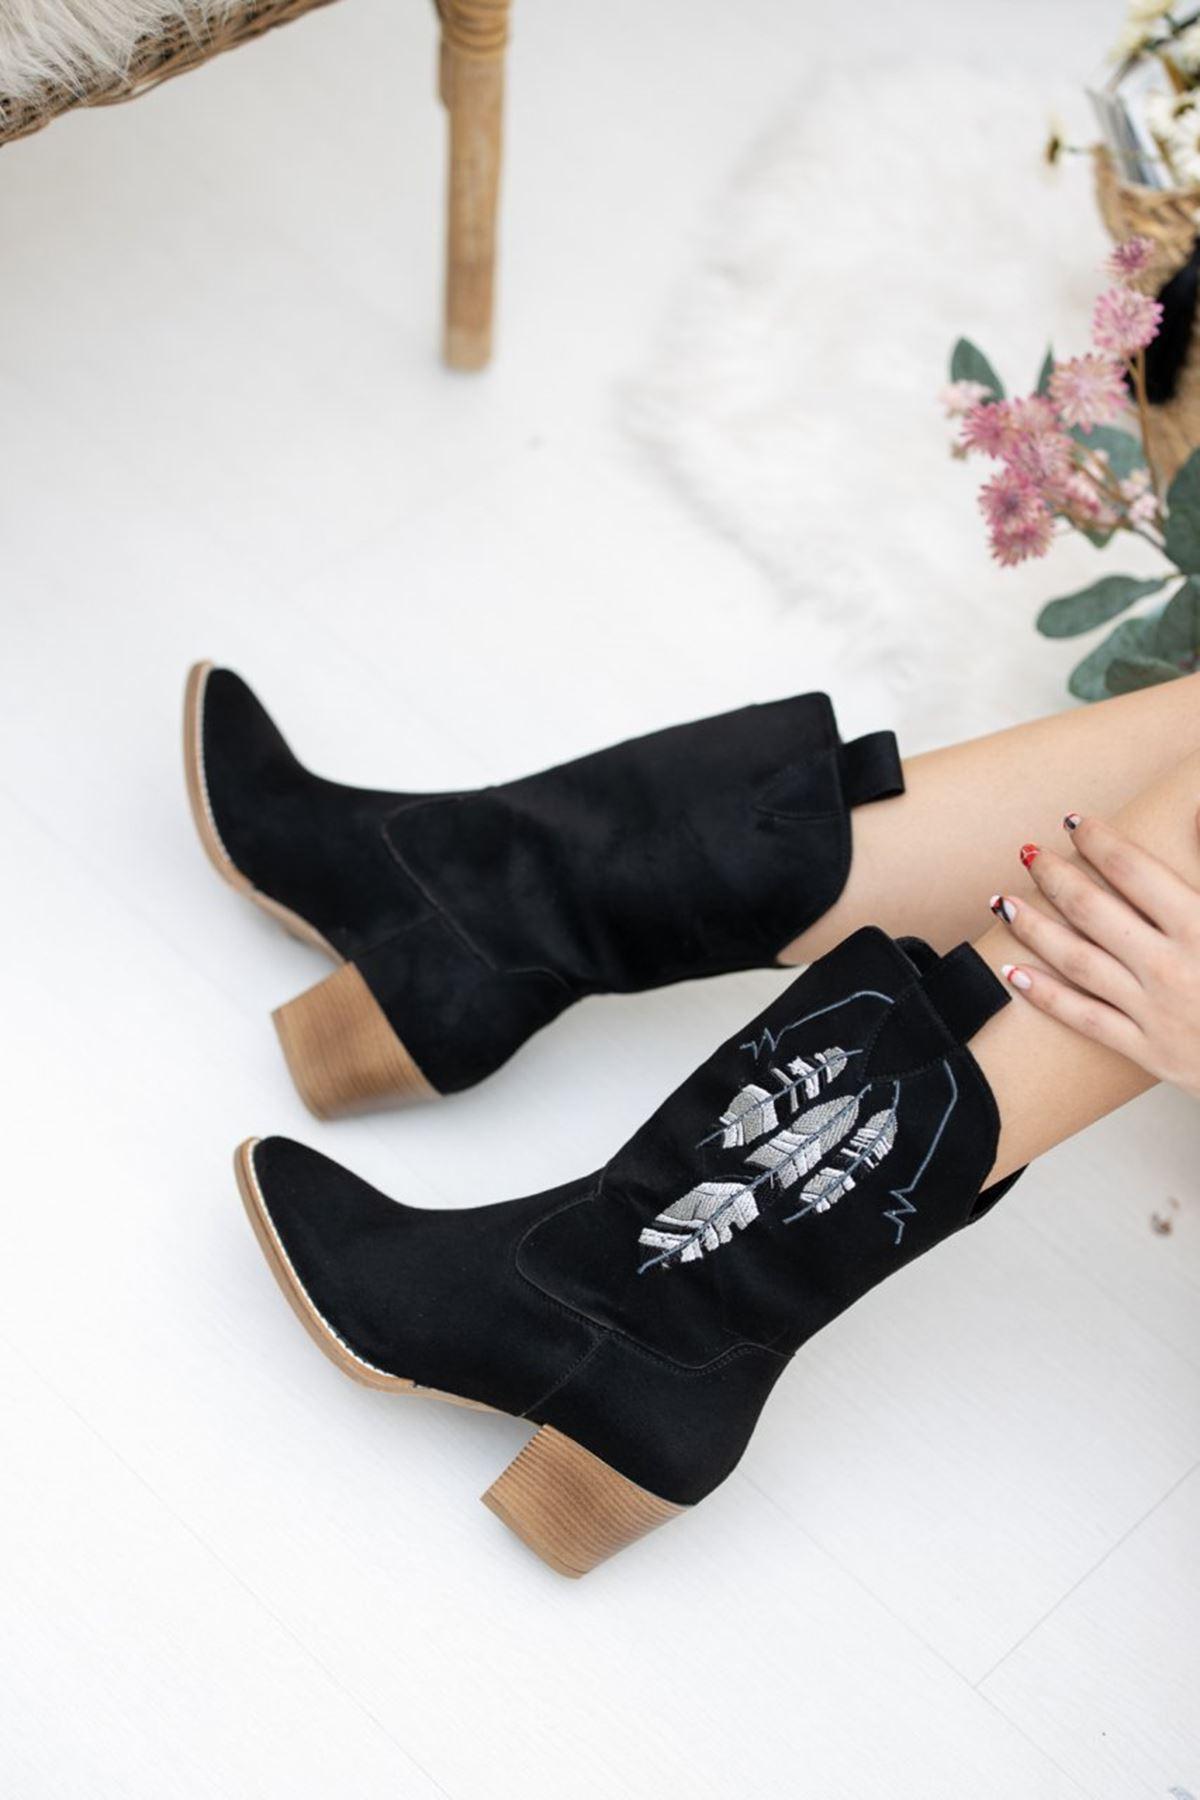 Kadın Piko Nakış Detay Kısa Topuk Kovboy Siyah Süet Çizme